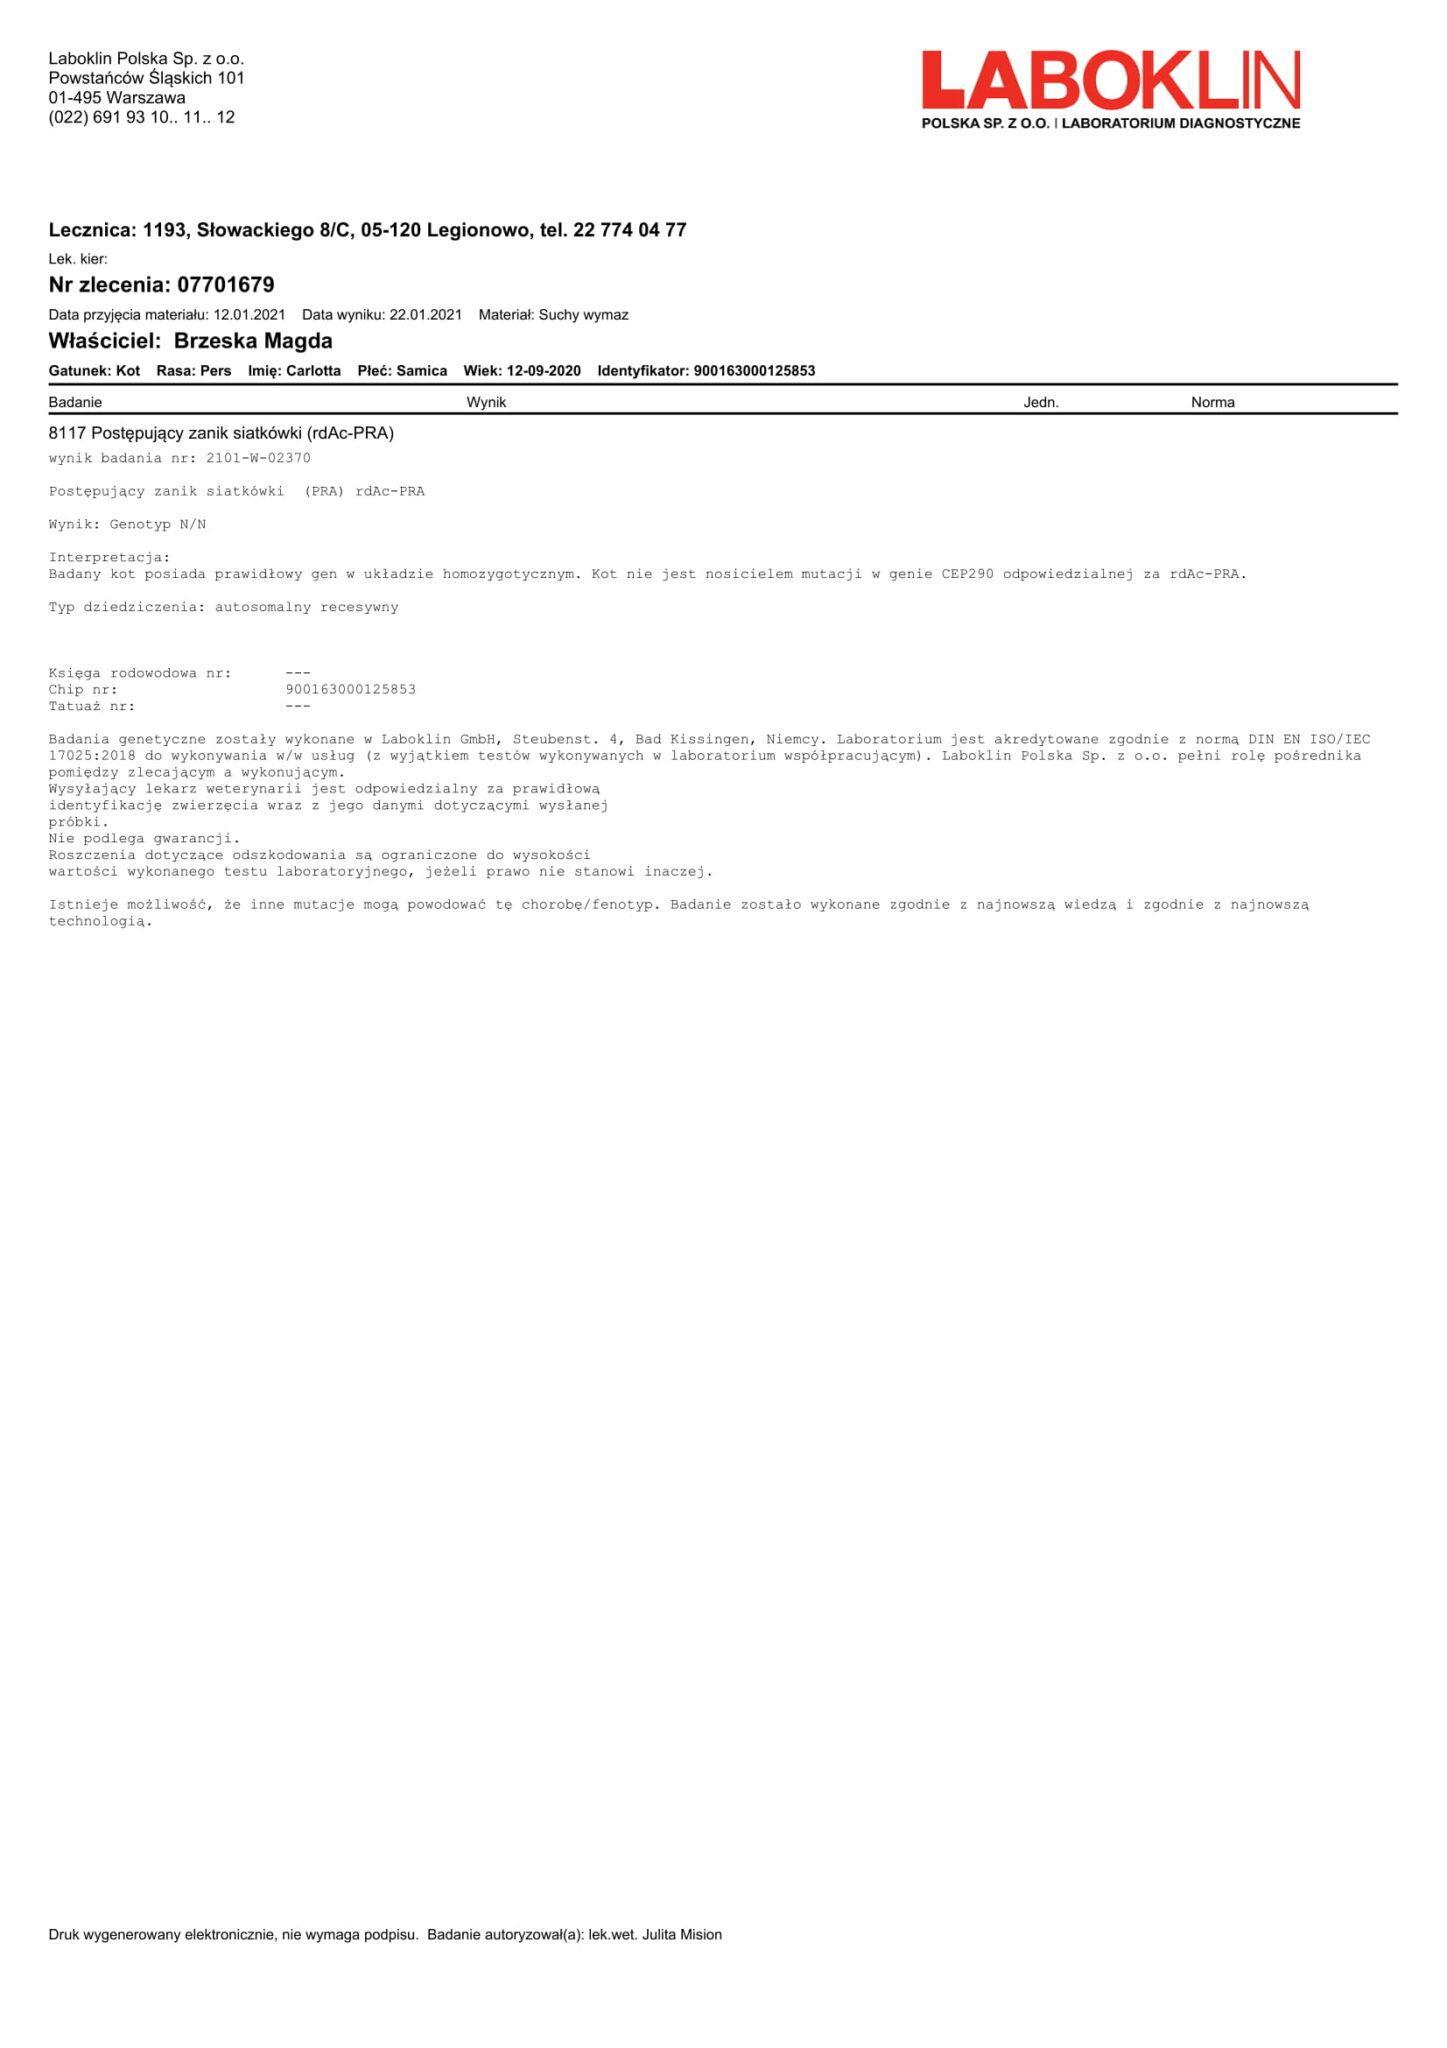 Brzeska-Magda-07701679-22.01.2021-1_5-5-1 Breeding